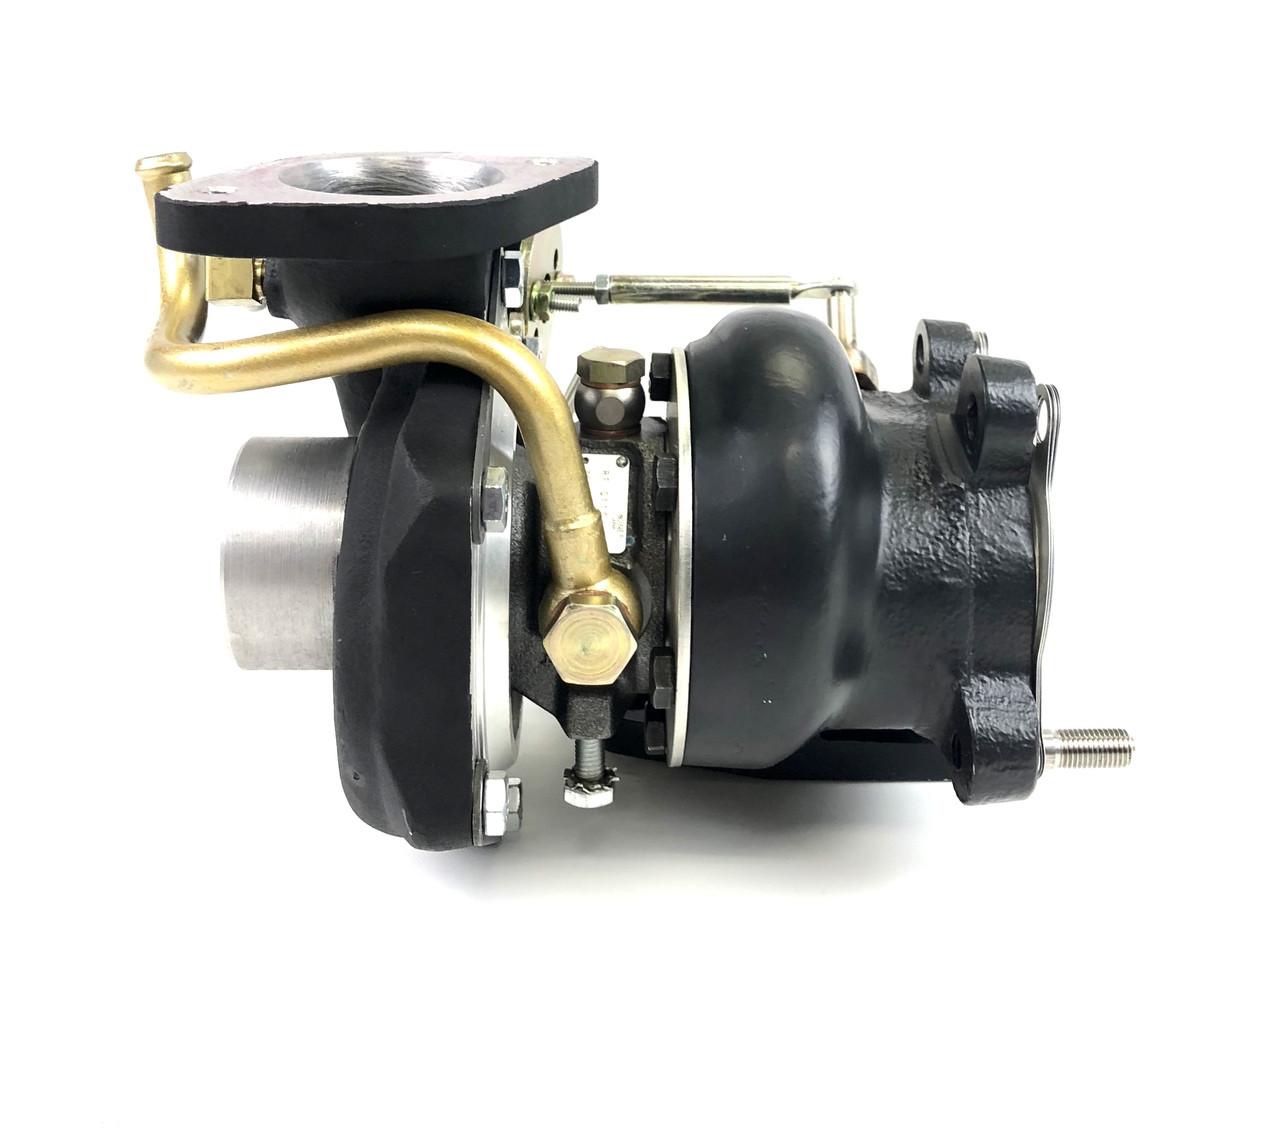 TurboTurbocharger Exiga GT EJ20 S1104M06A848A